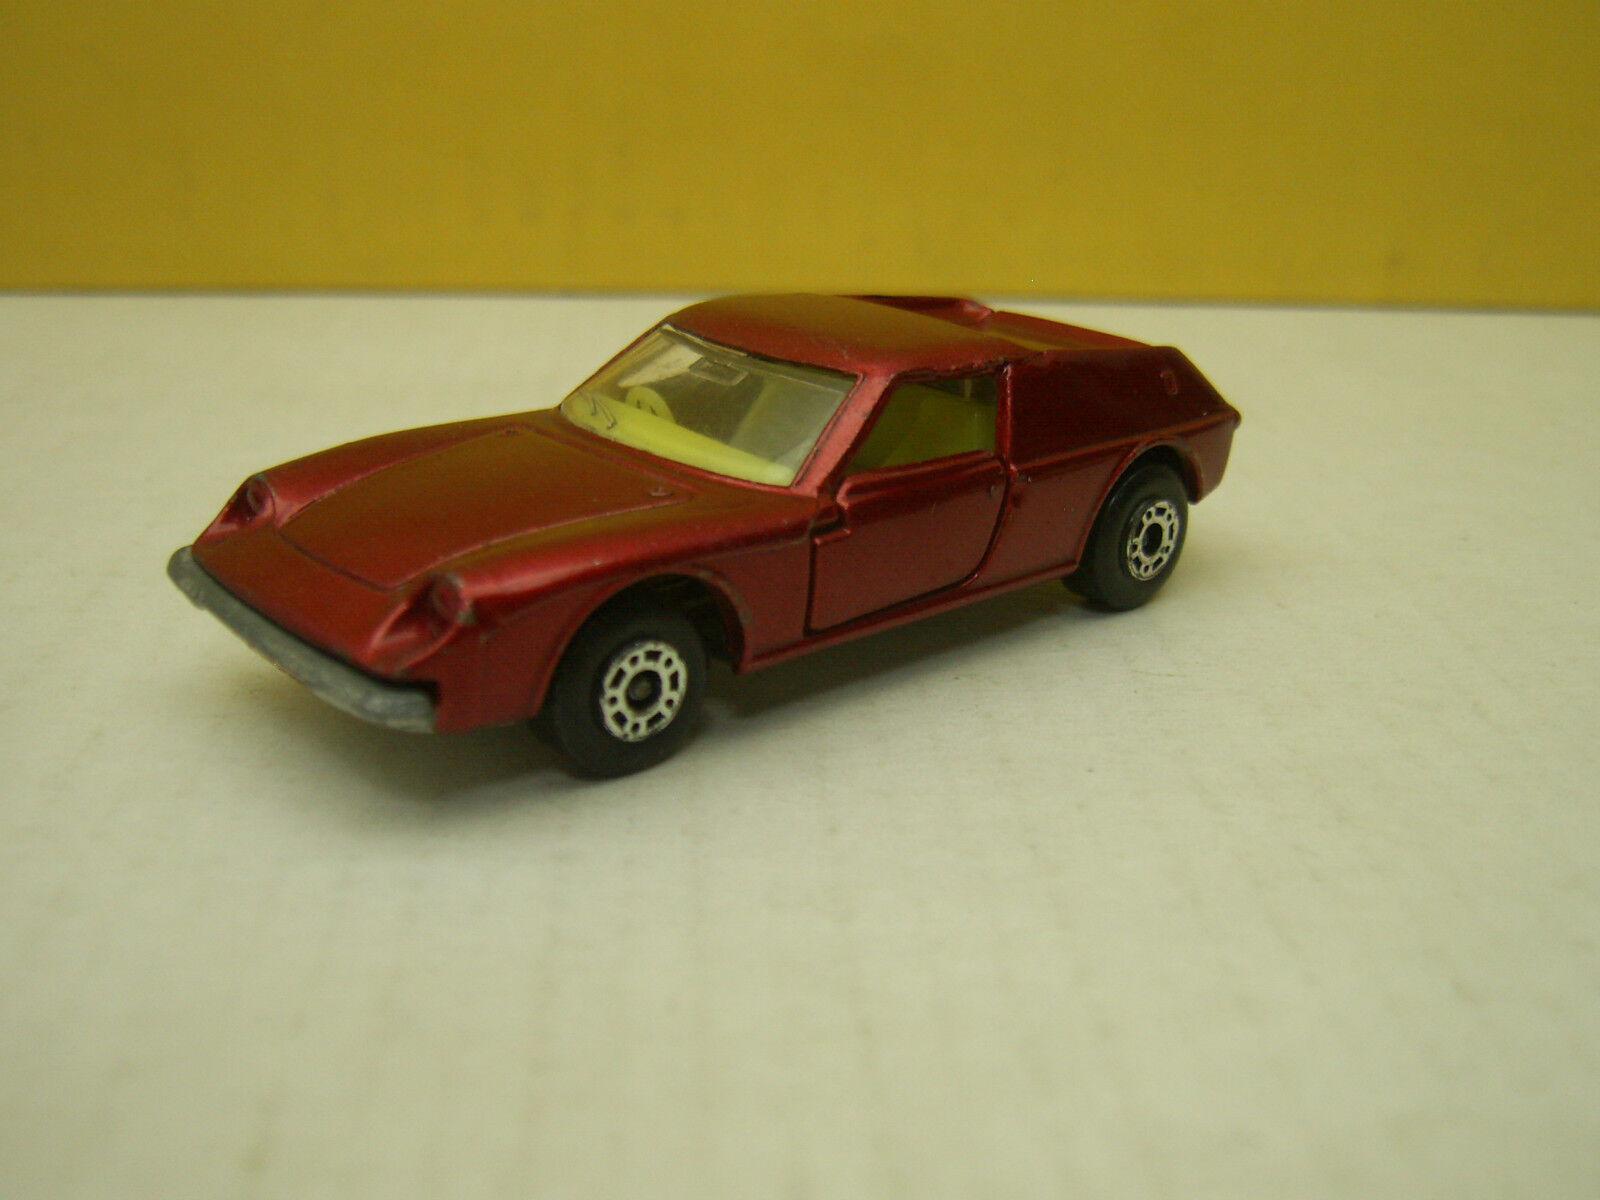 hasta un 50% de descuento Búlgaro Matchbox súperfast Lotus Europa Europa Europa № 5 Rojo Metálico 1969  barato y de moda